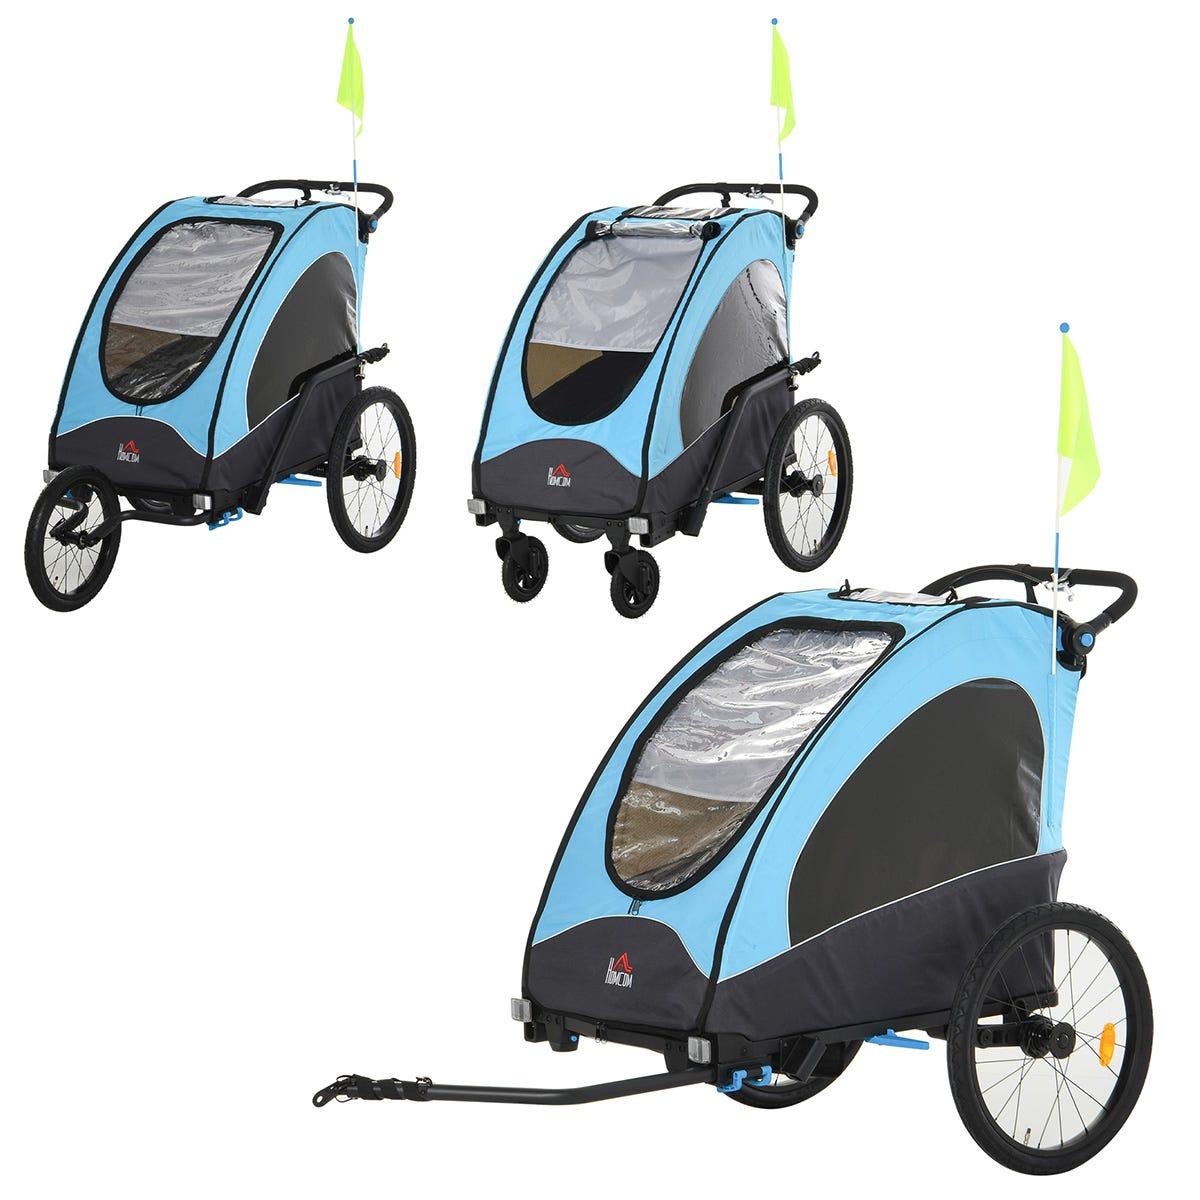 Reiten 3-in-1 Kids 2 Seater Bike Trailer & Stroller with Shock Absorber - Blue/Black